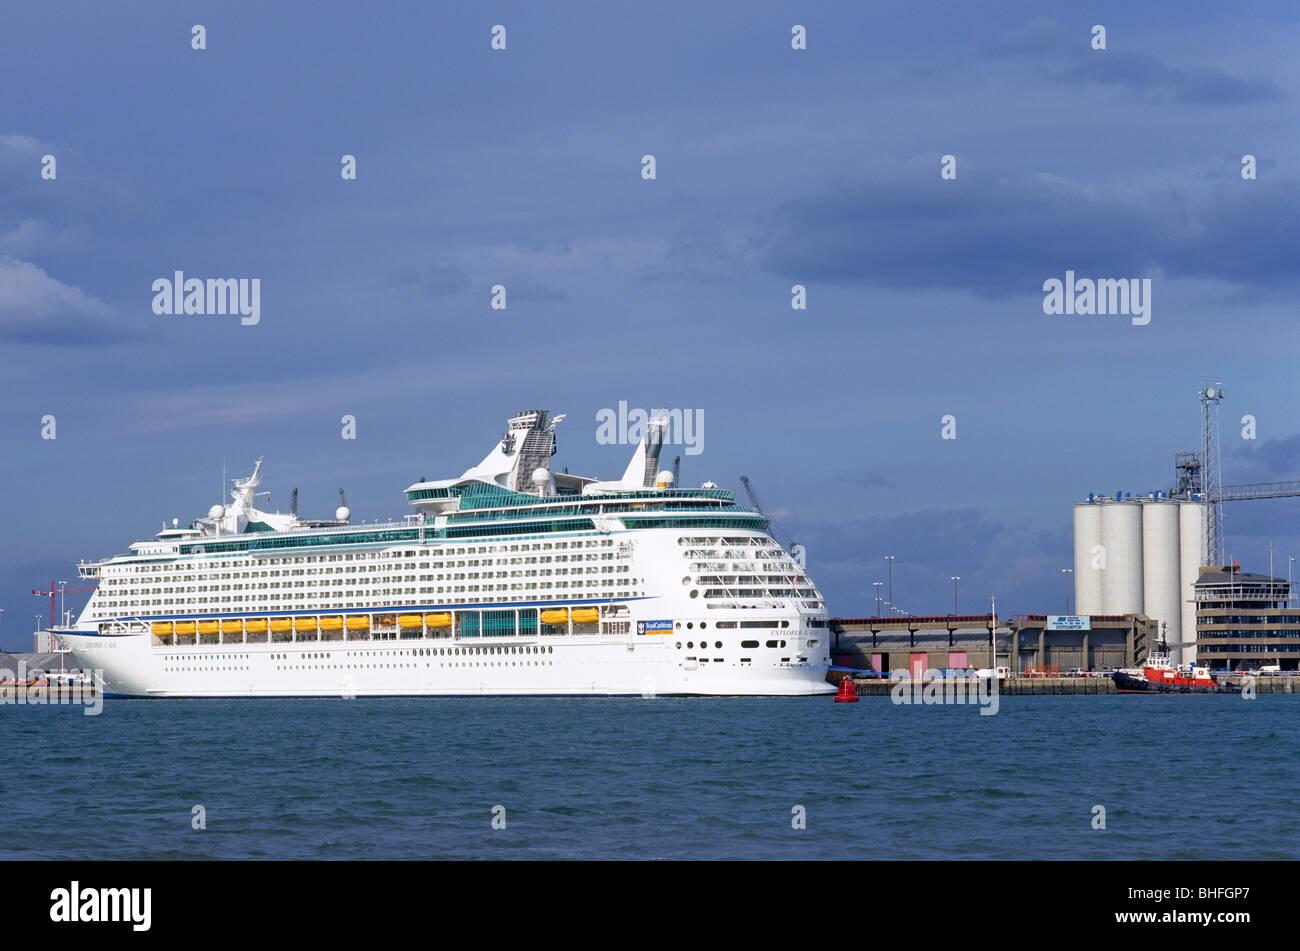 Explorer of the Seas, Royal Caribbean Line ship, Southampton, UK - Stock Image